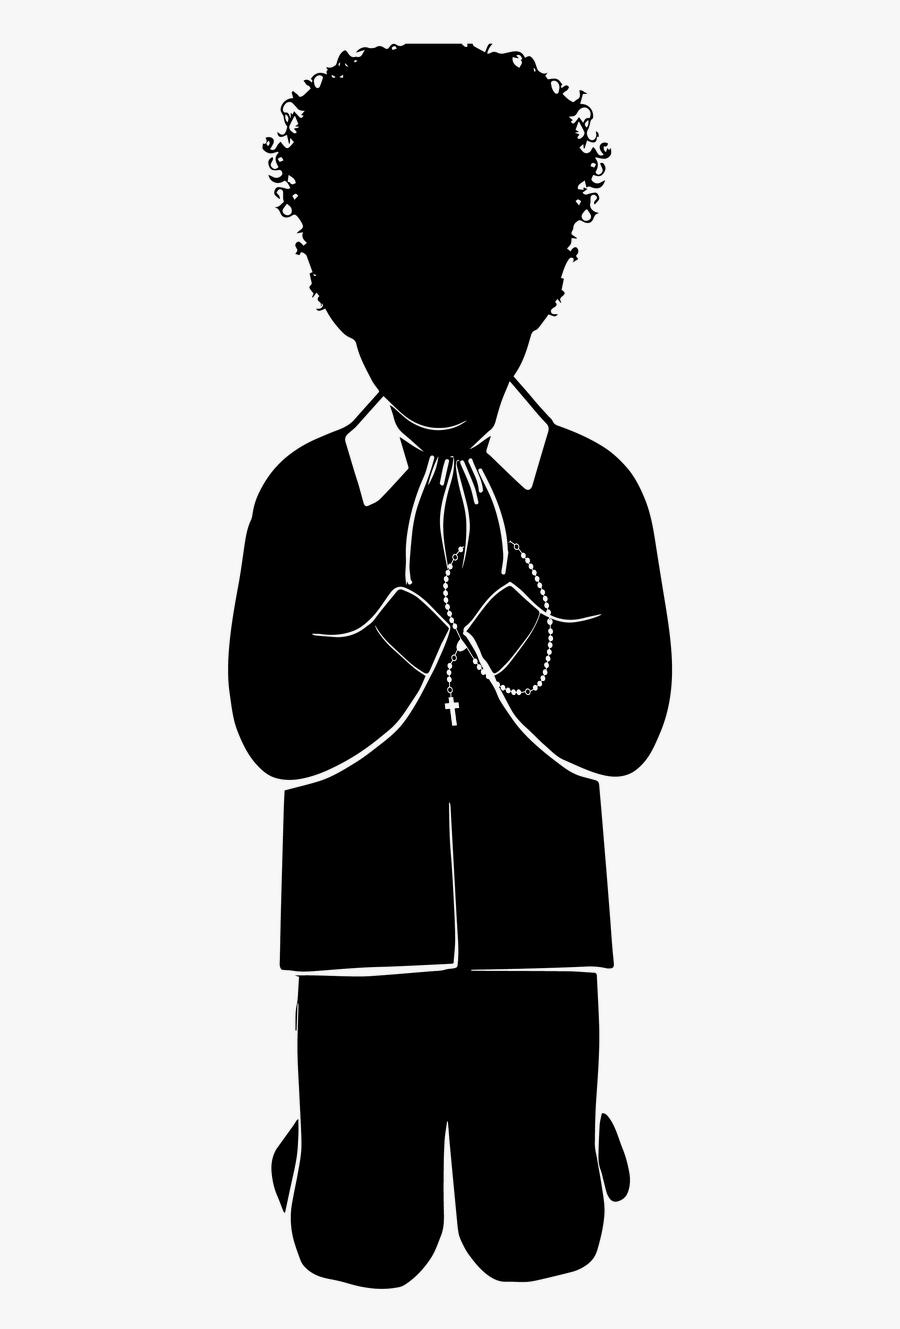 First Communion Catholic Boy Praying - Illustration, Transparent Clipart